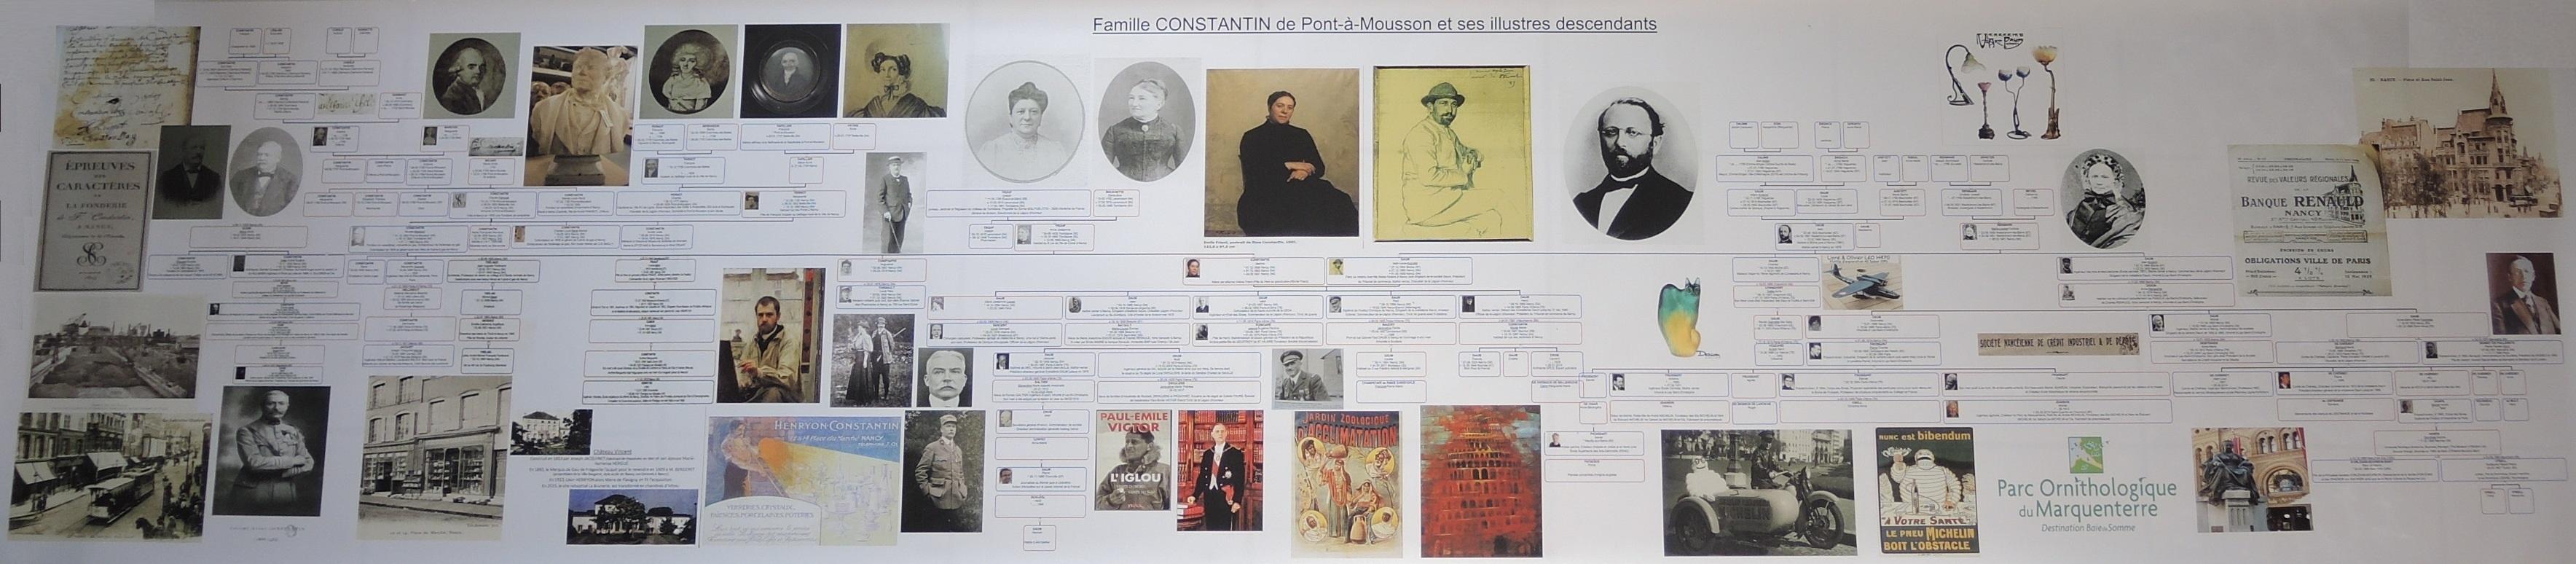 Famille Constantin